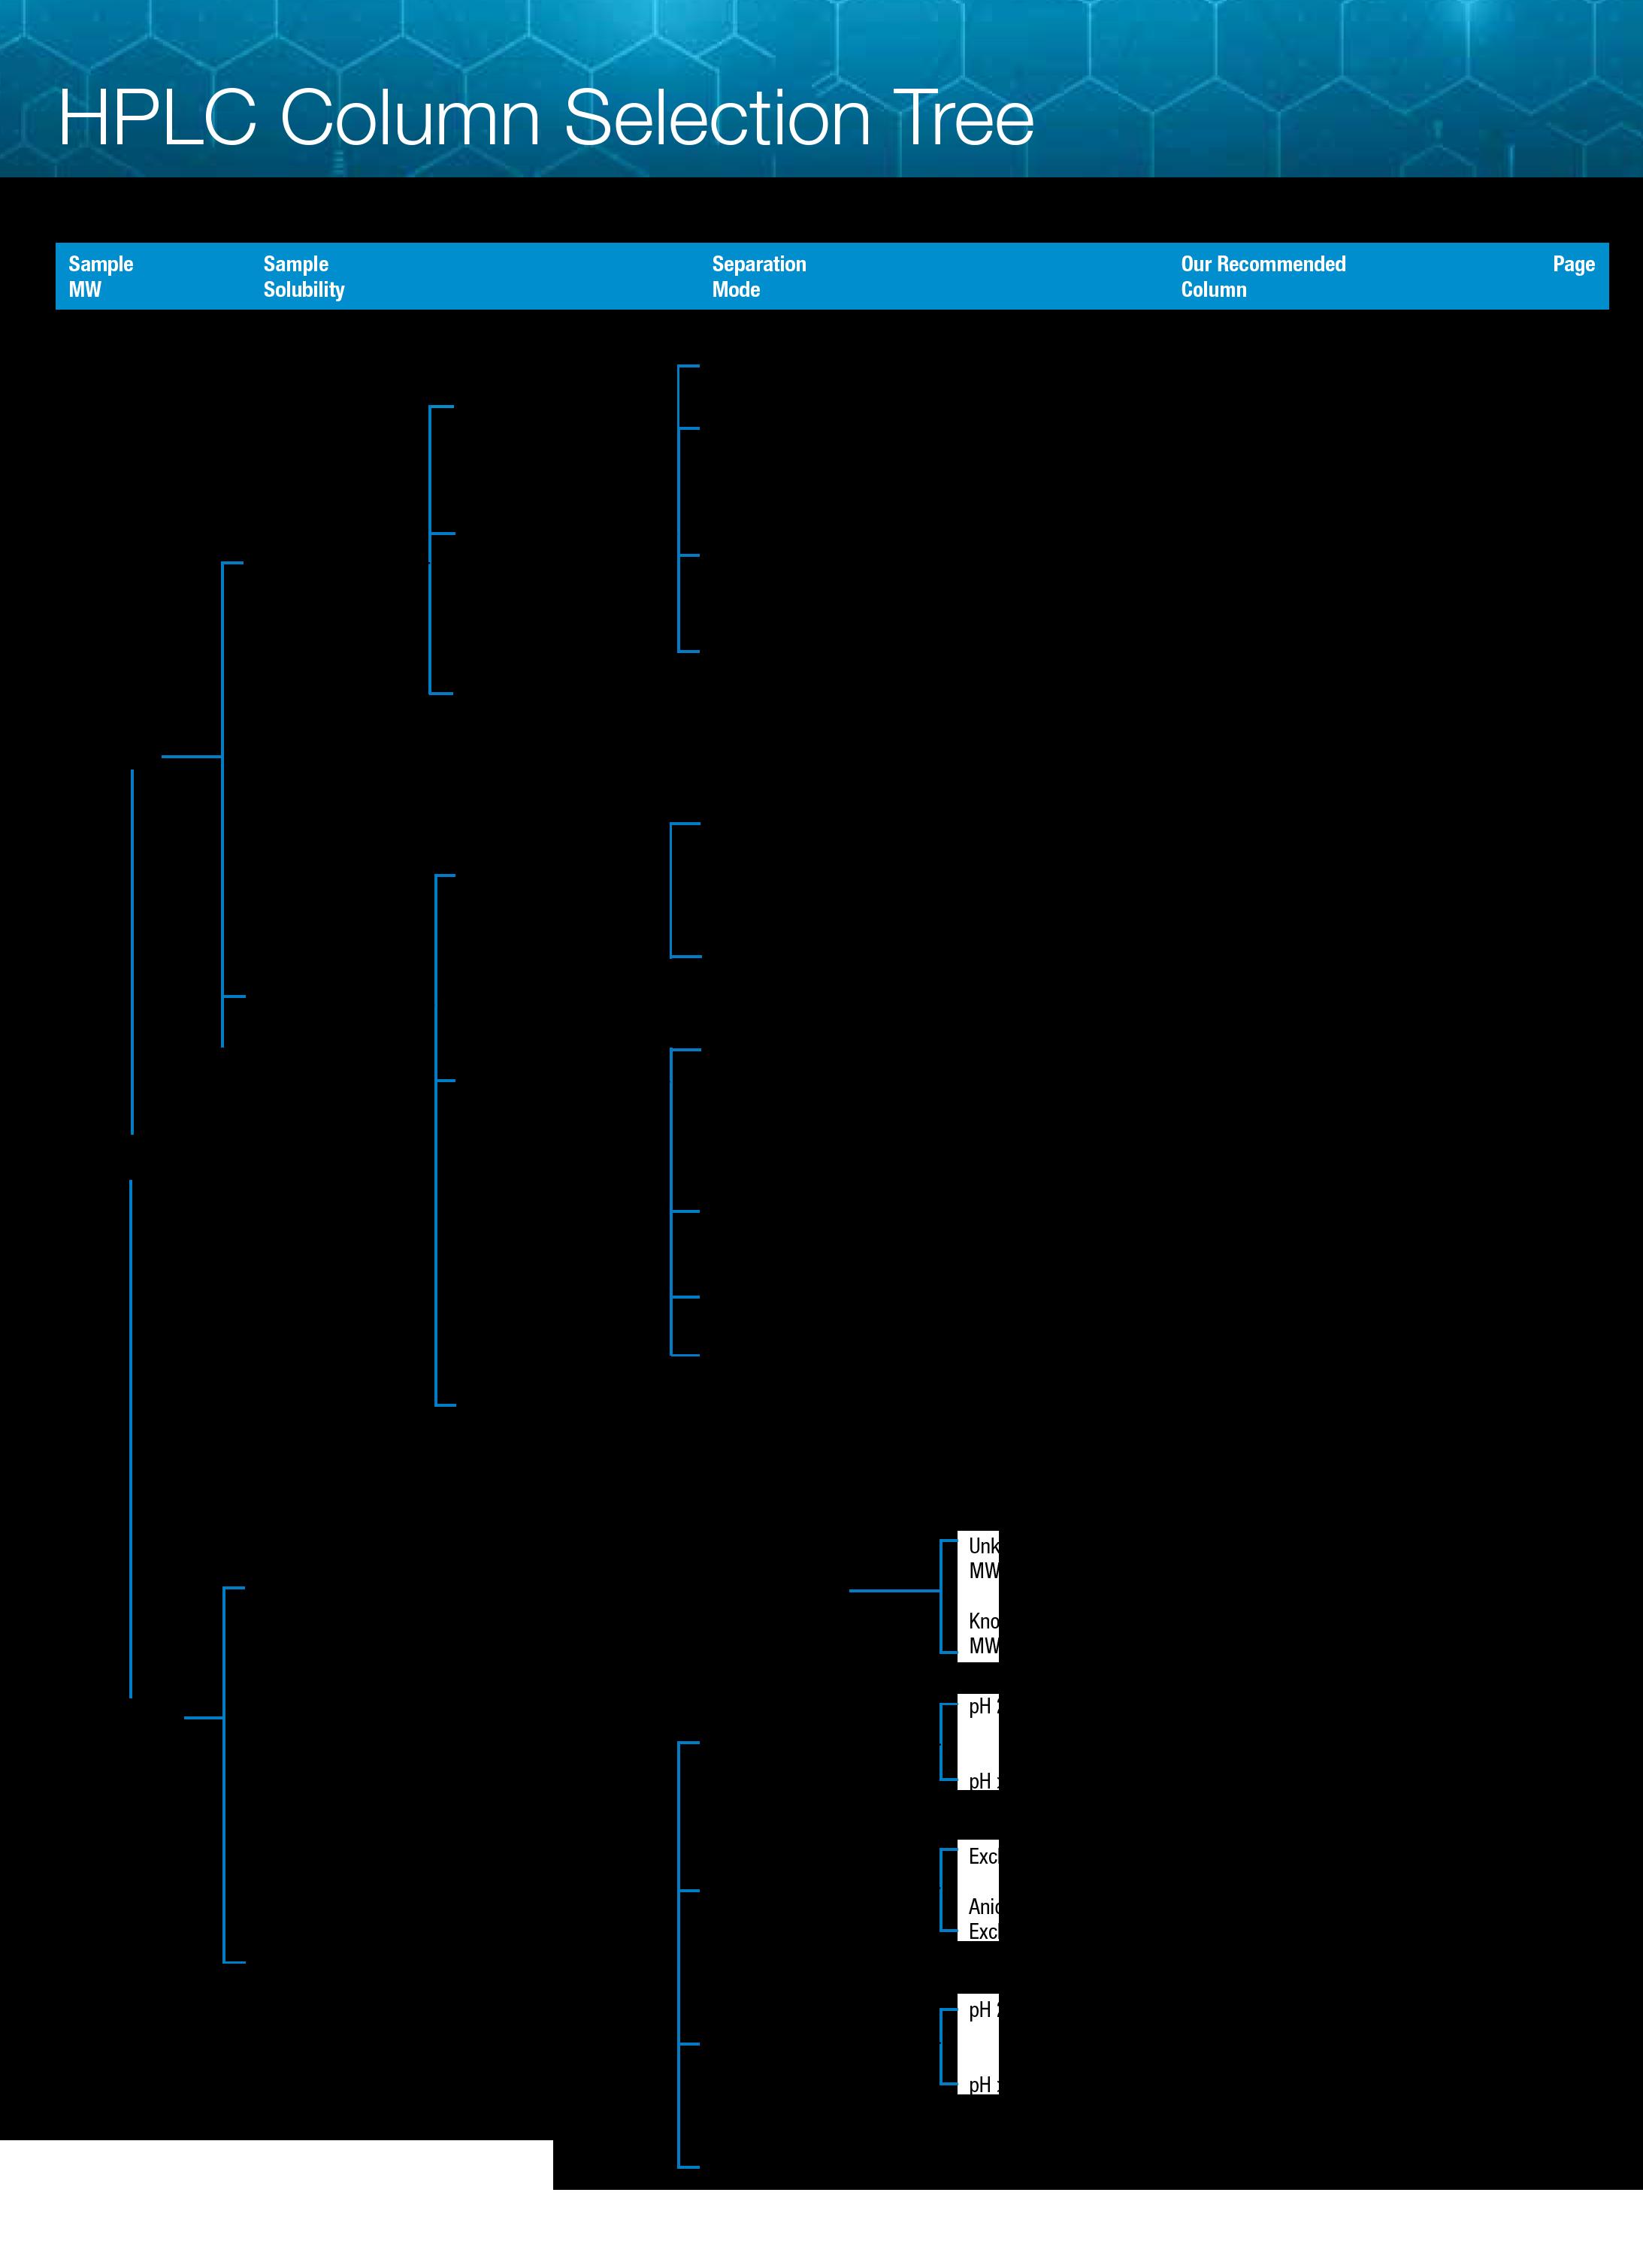 HPLC Column selection tree